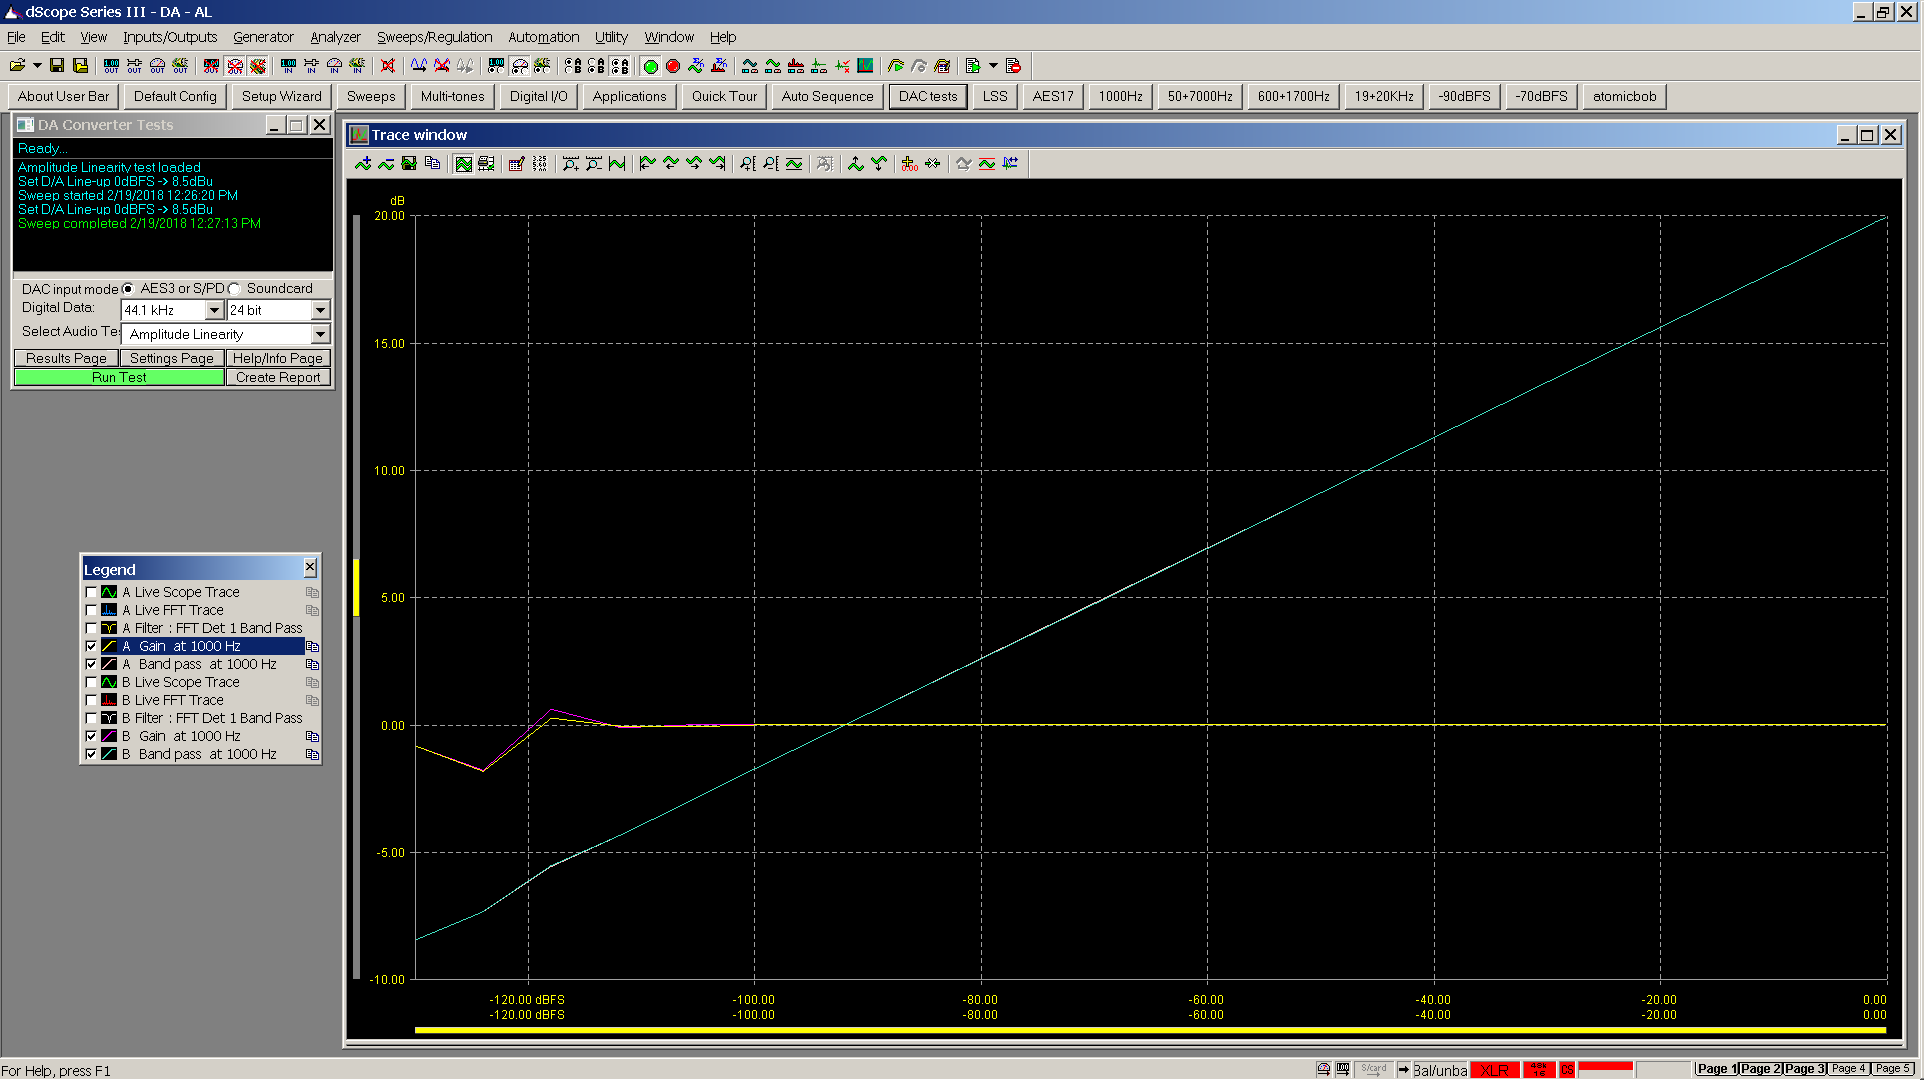 20180219-11 Yggdrasil SE 1 KHz gain linearity + bandpass - spdif.PNG